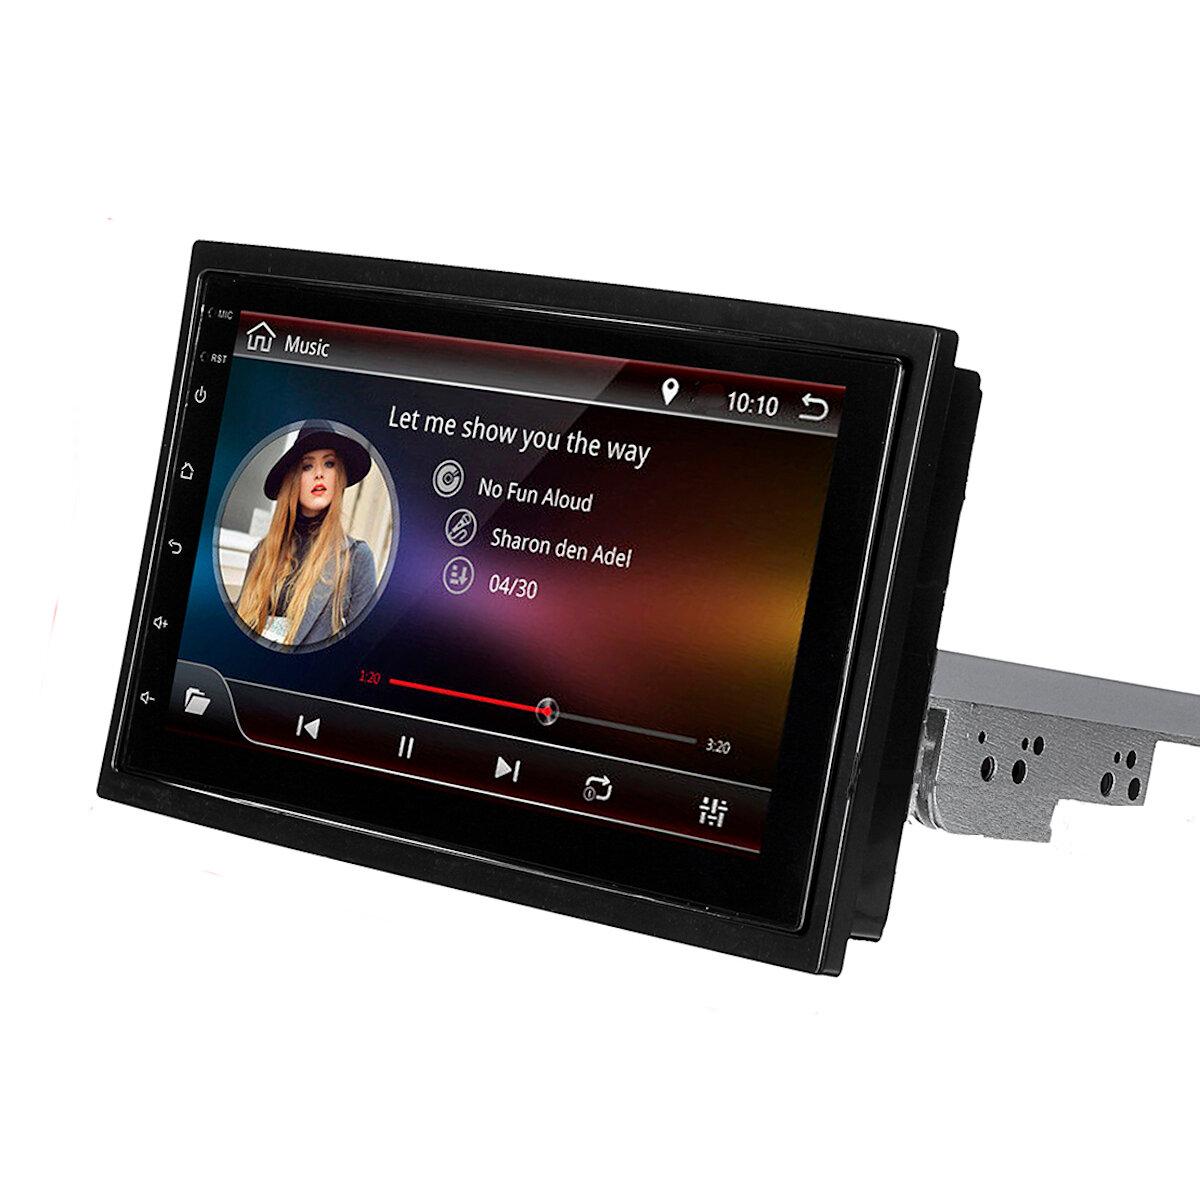 एंड्रॉइड 8.1 कार एमपी 5 प्लेयर रेडियो स्टीरियो 4 कोर GPS टच स्क्रीन वाईफ़ाई एडजस्टेबल रोटेशन के लिए 7 इ